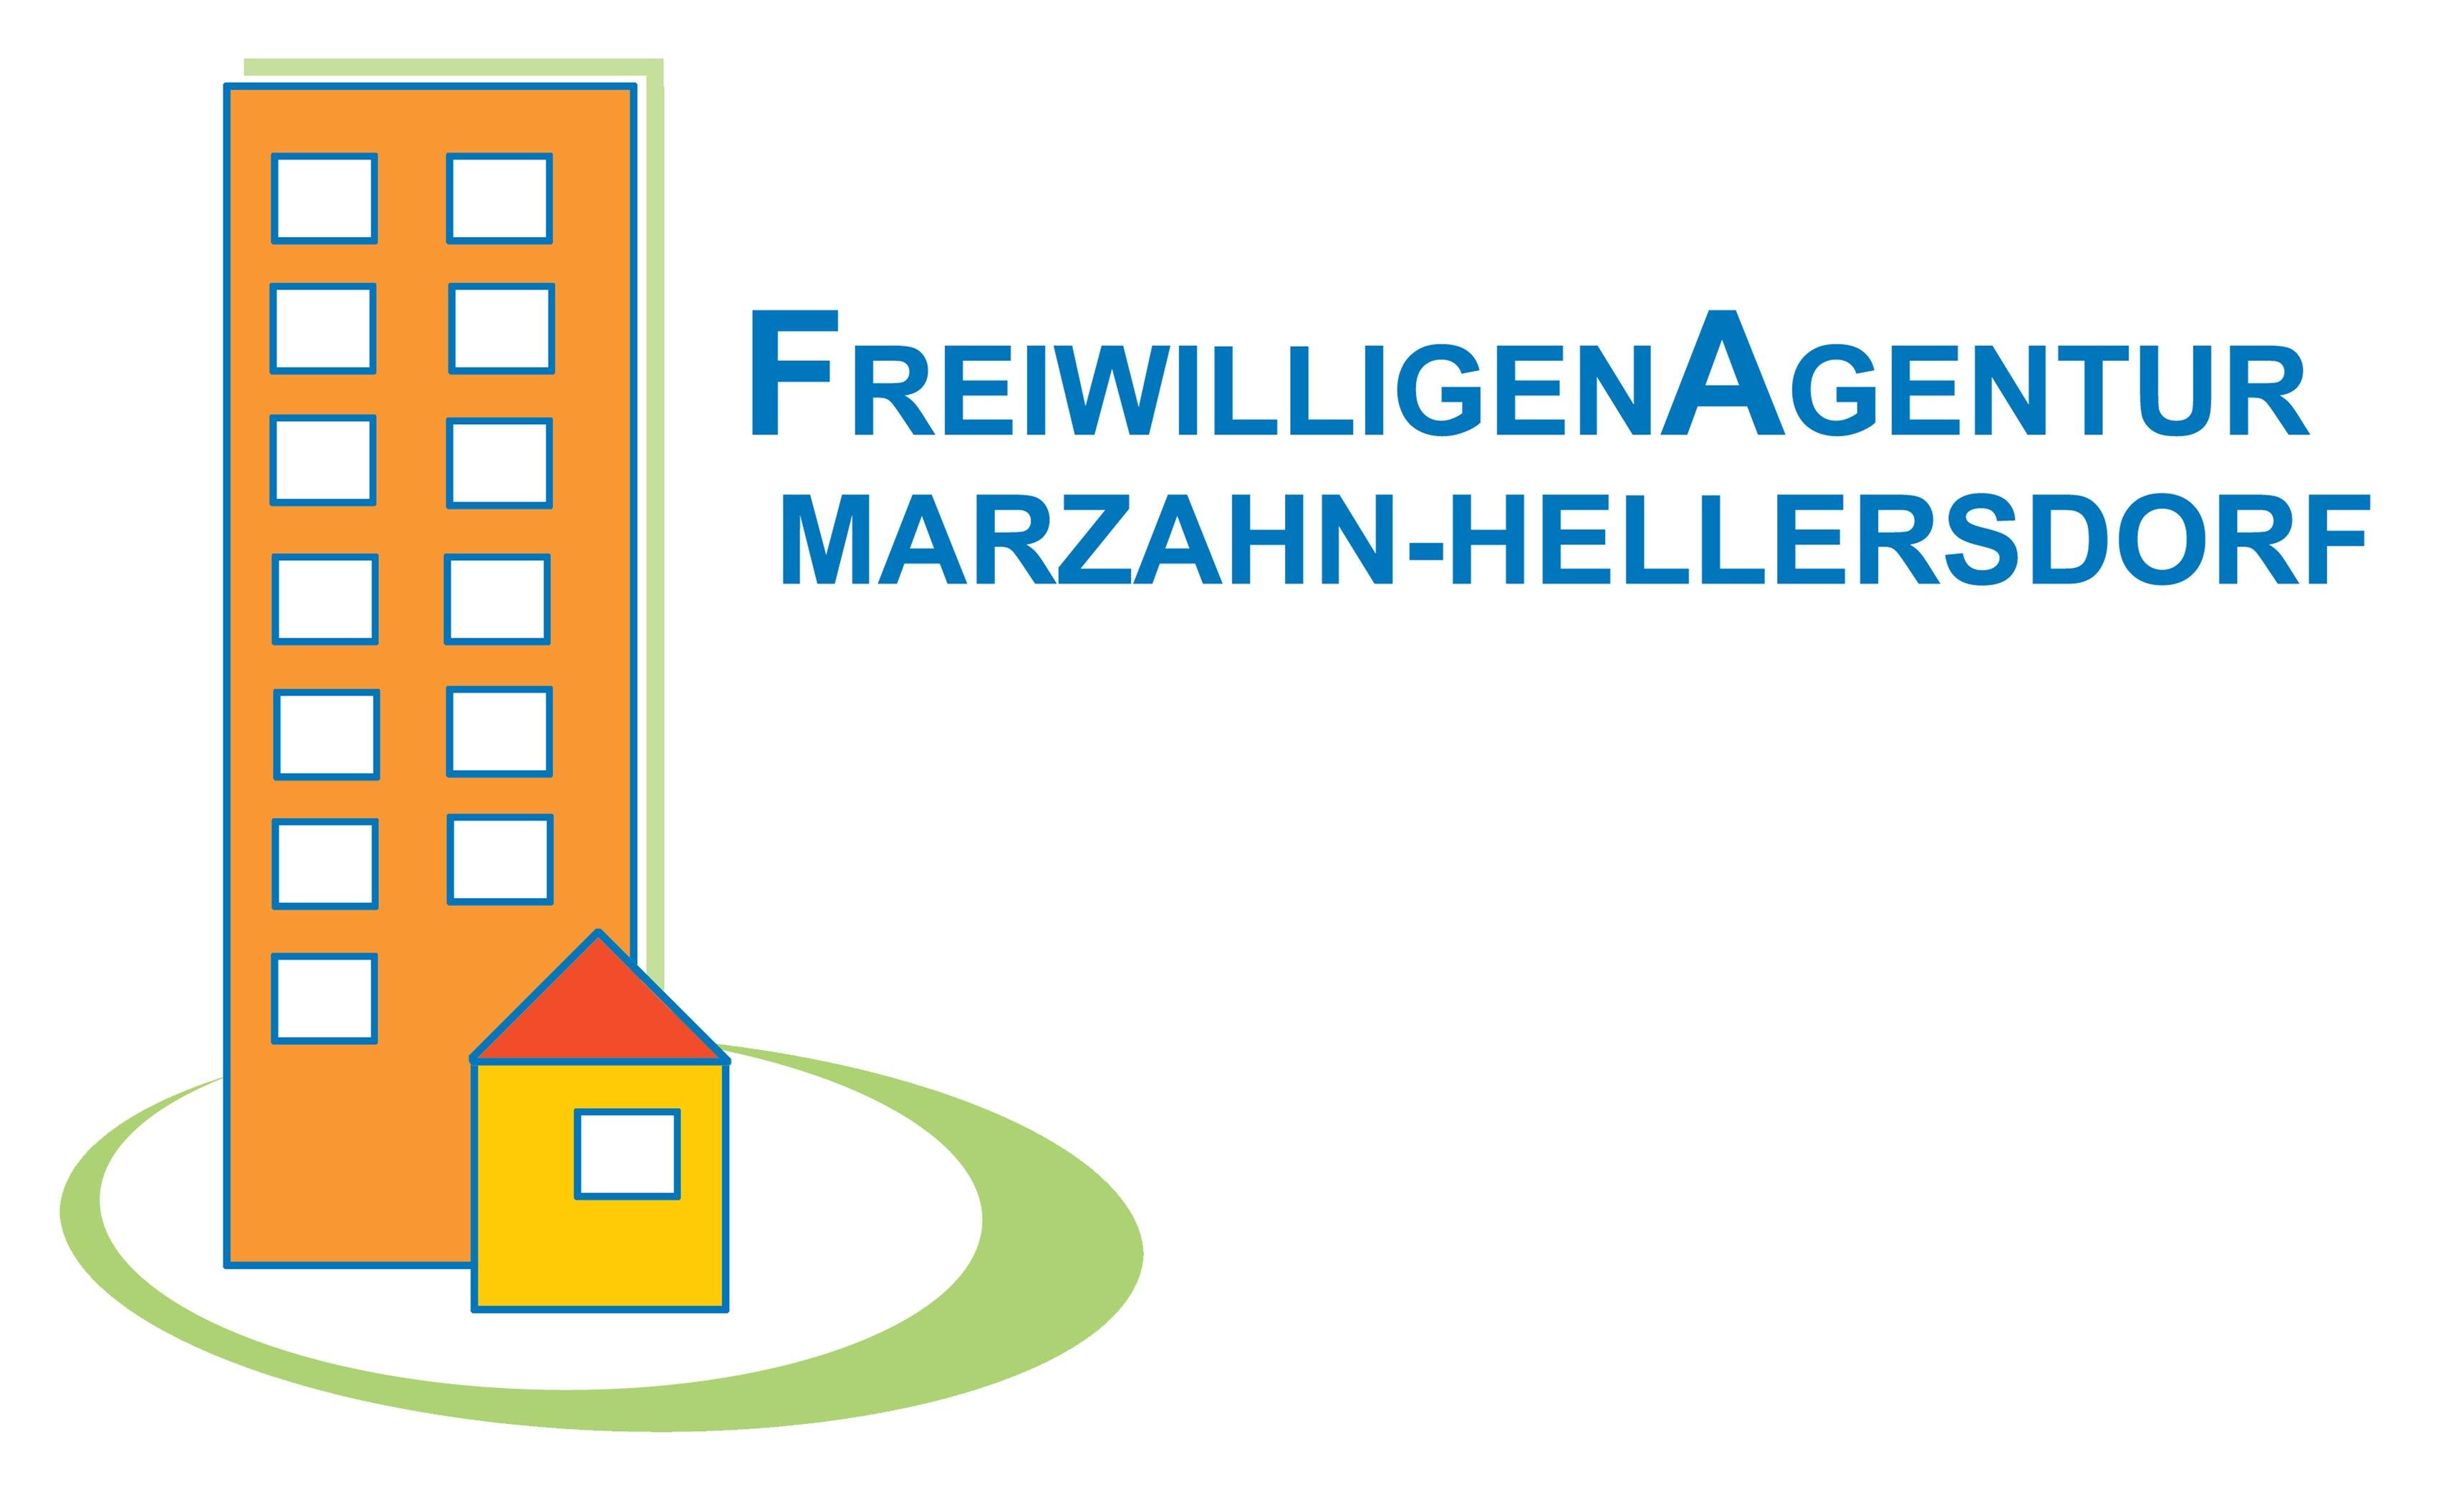 FreiwilligenAgentur Marzahn-Hellersdorf